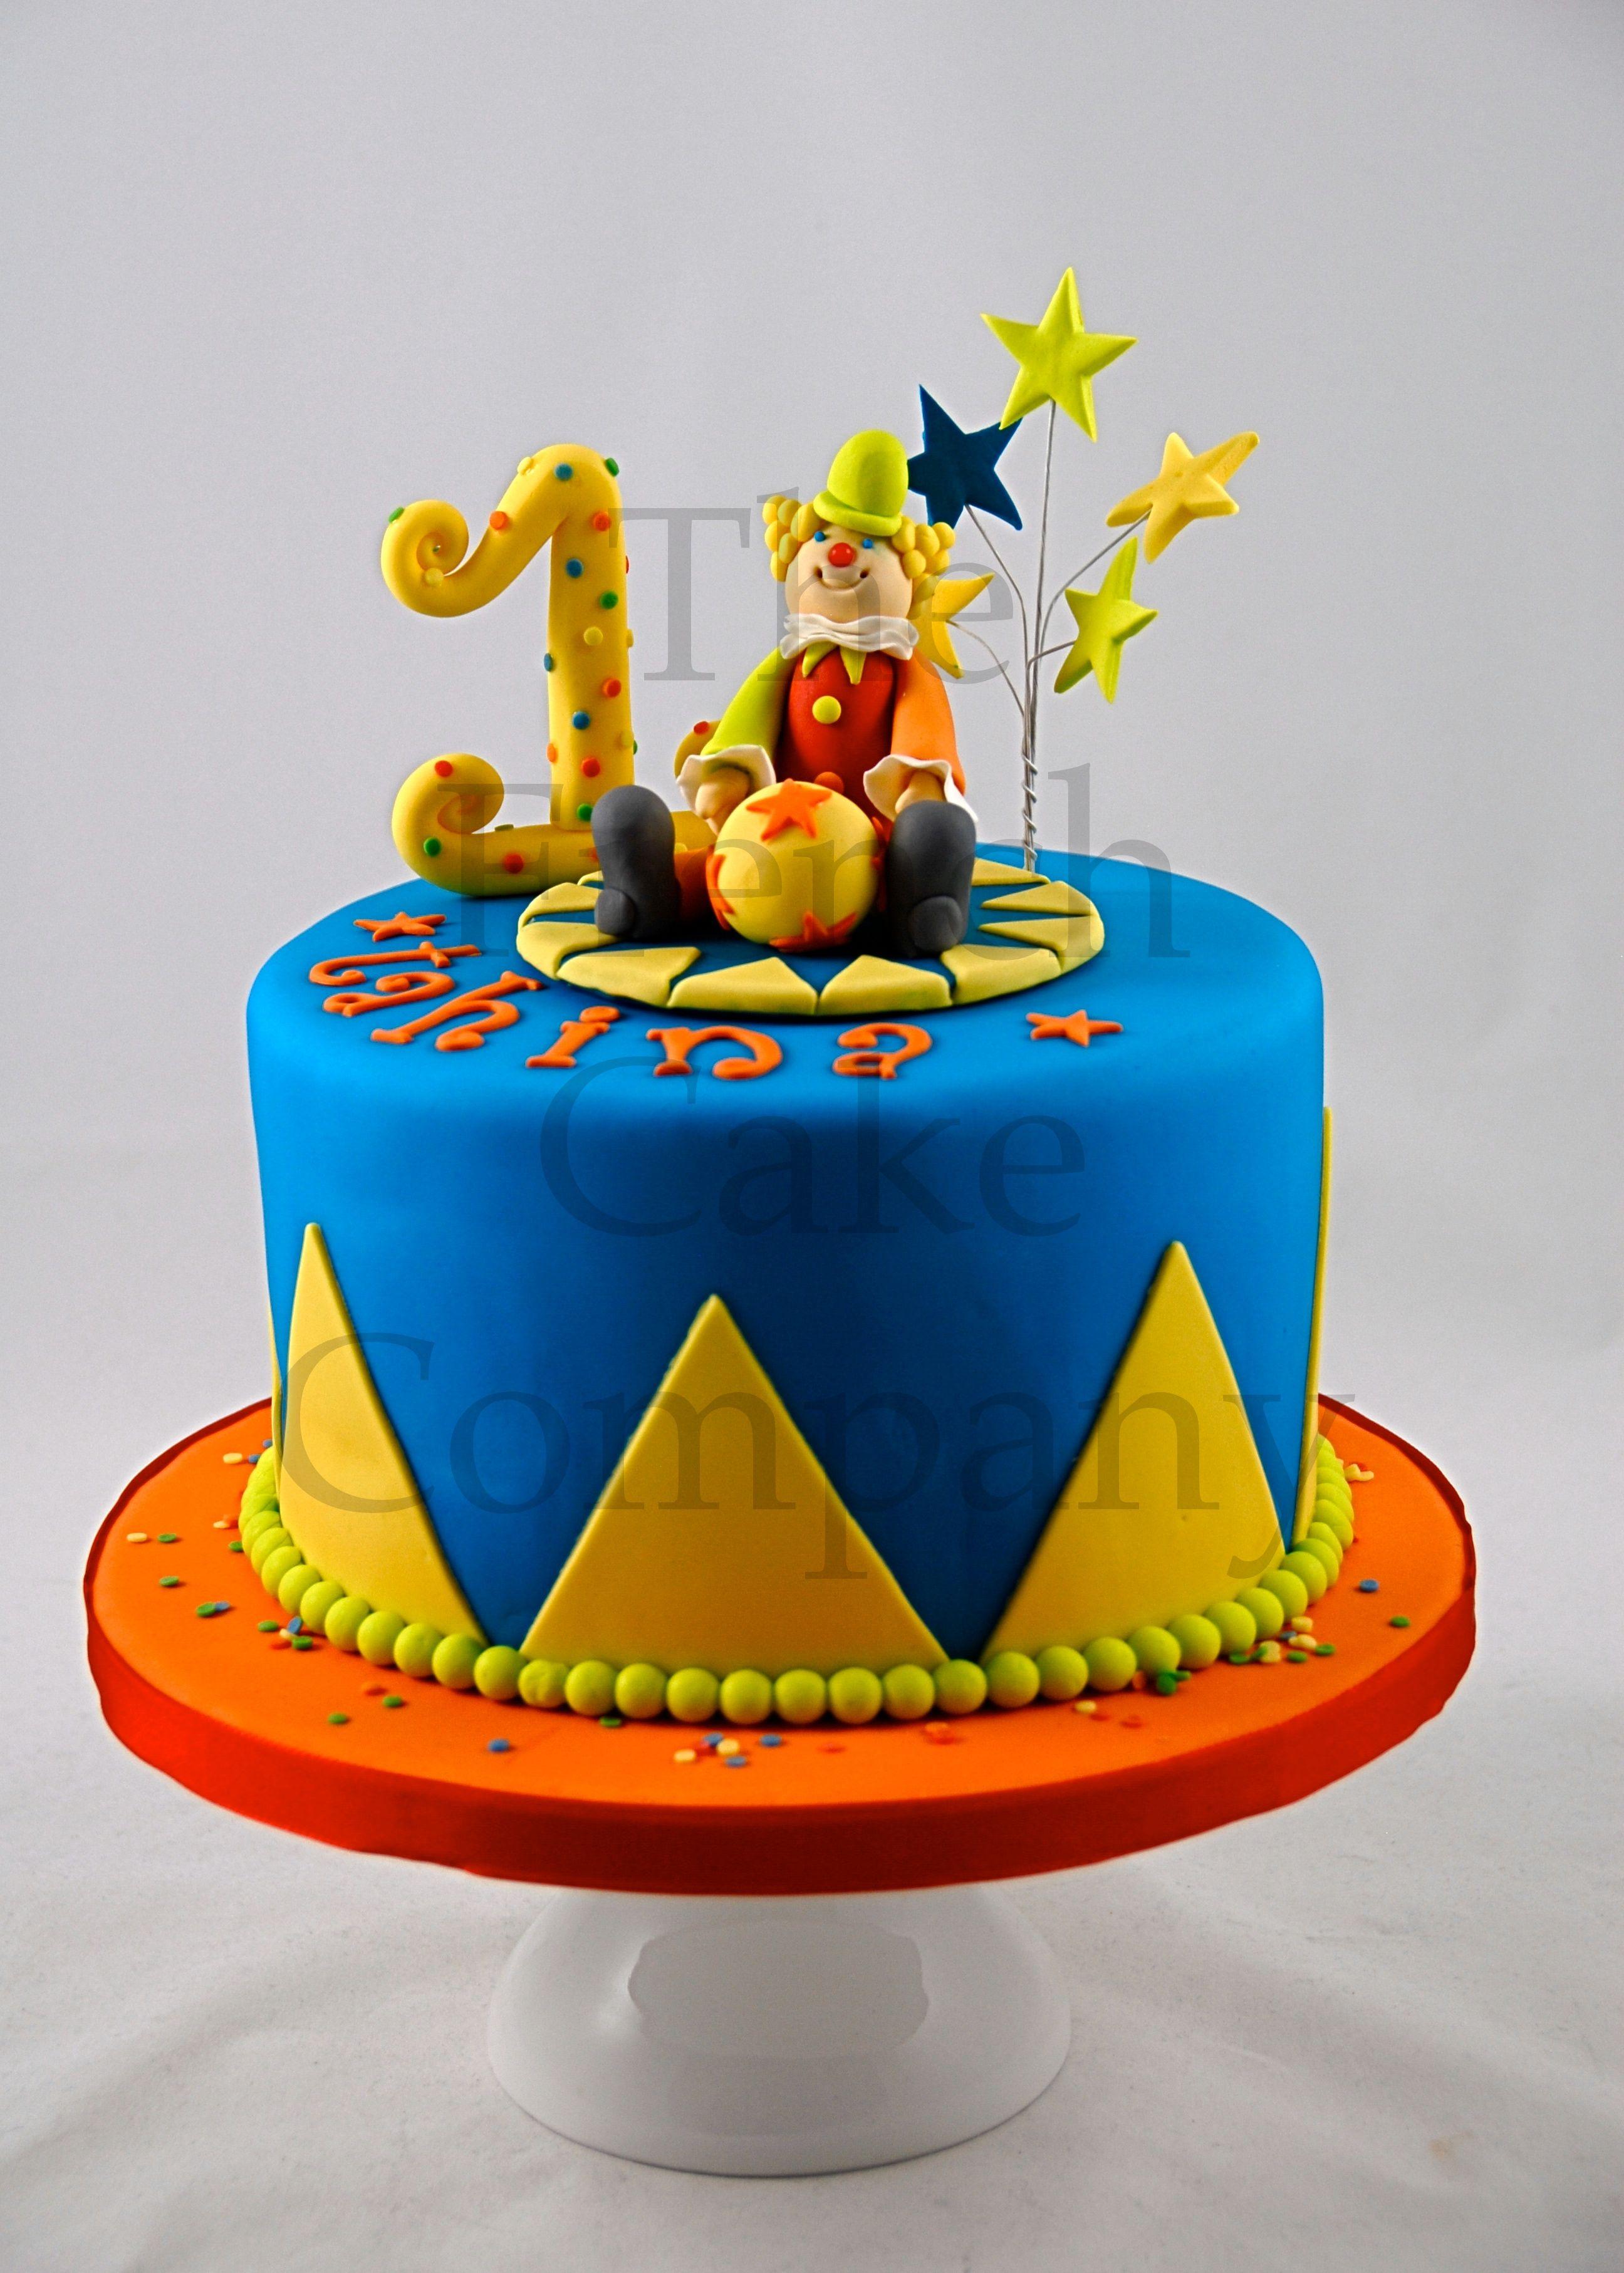 cake for toddlers clown gateau d 39 anniversaire pour. Black Bedroom Furniture Sets. Home Design Ideas